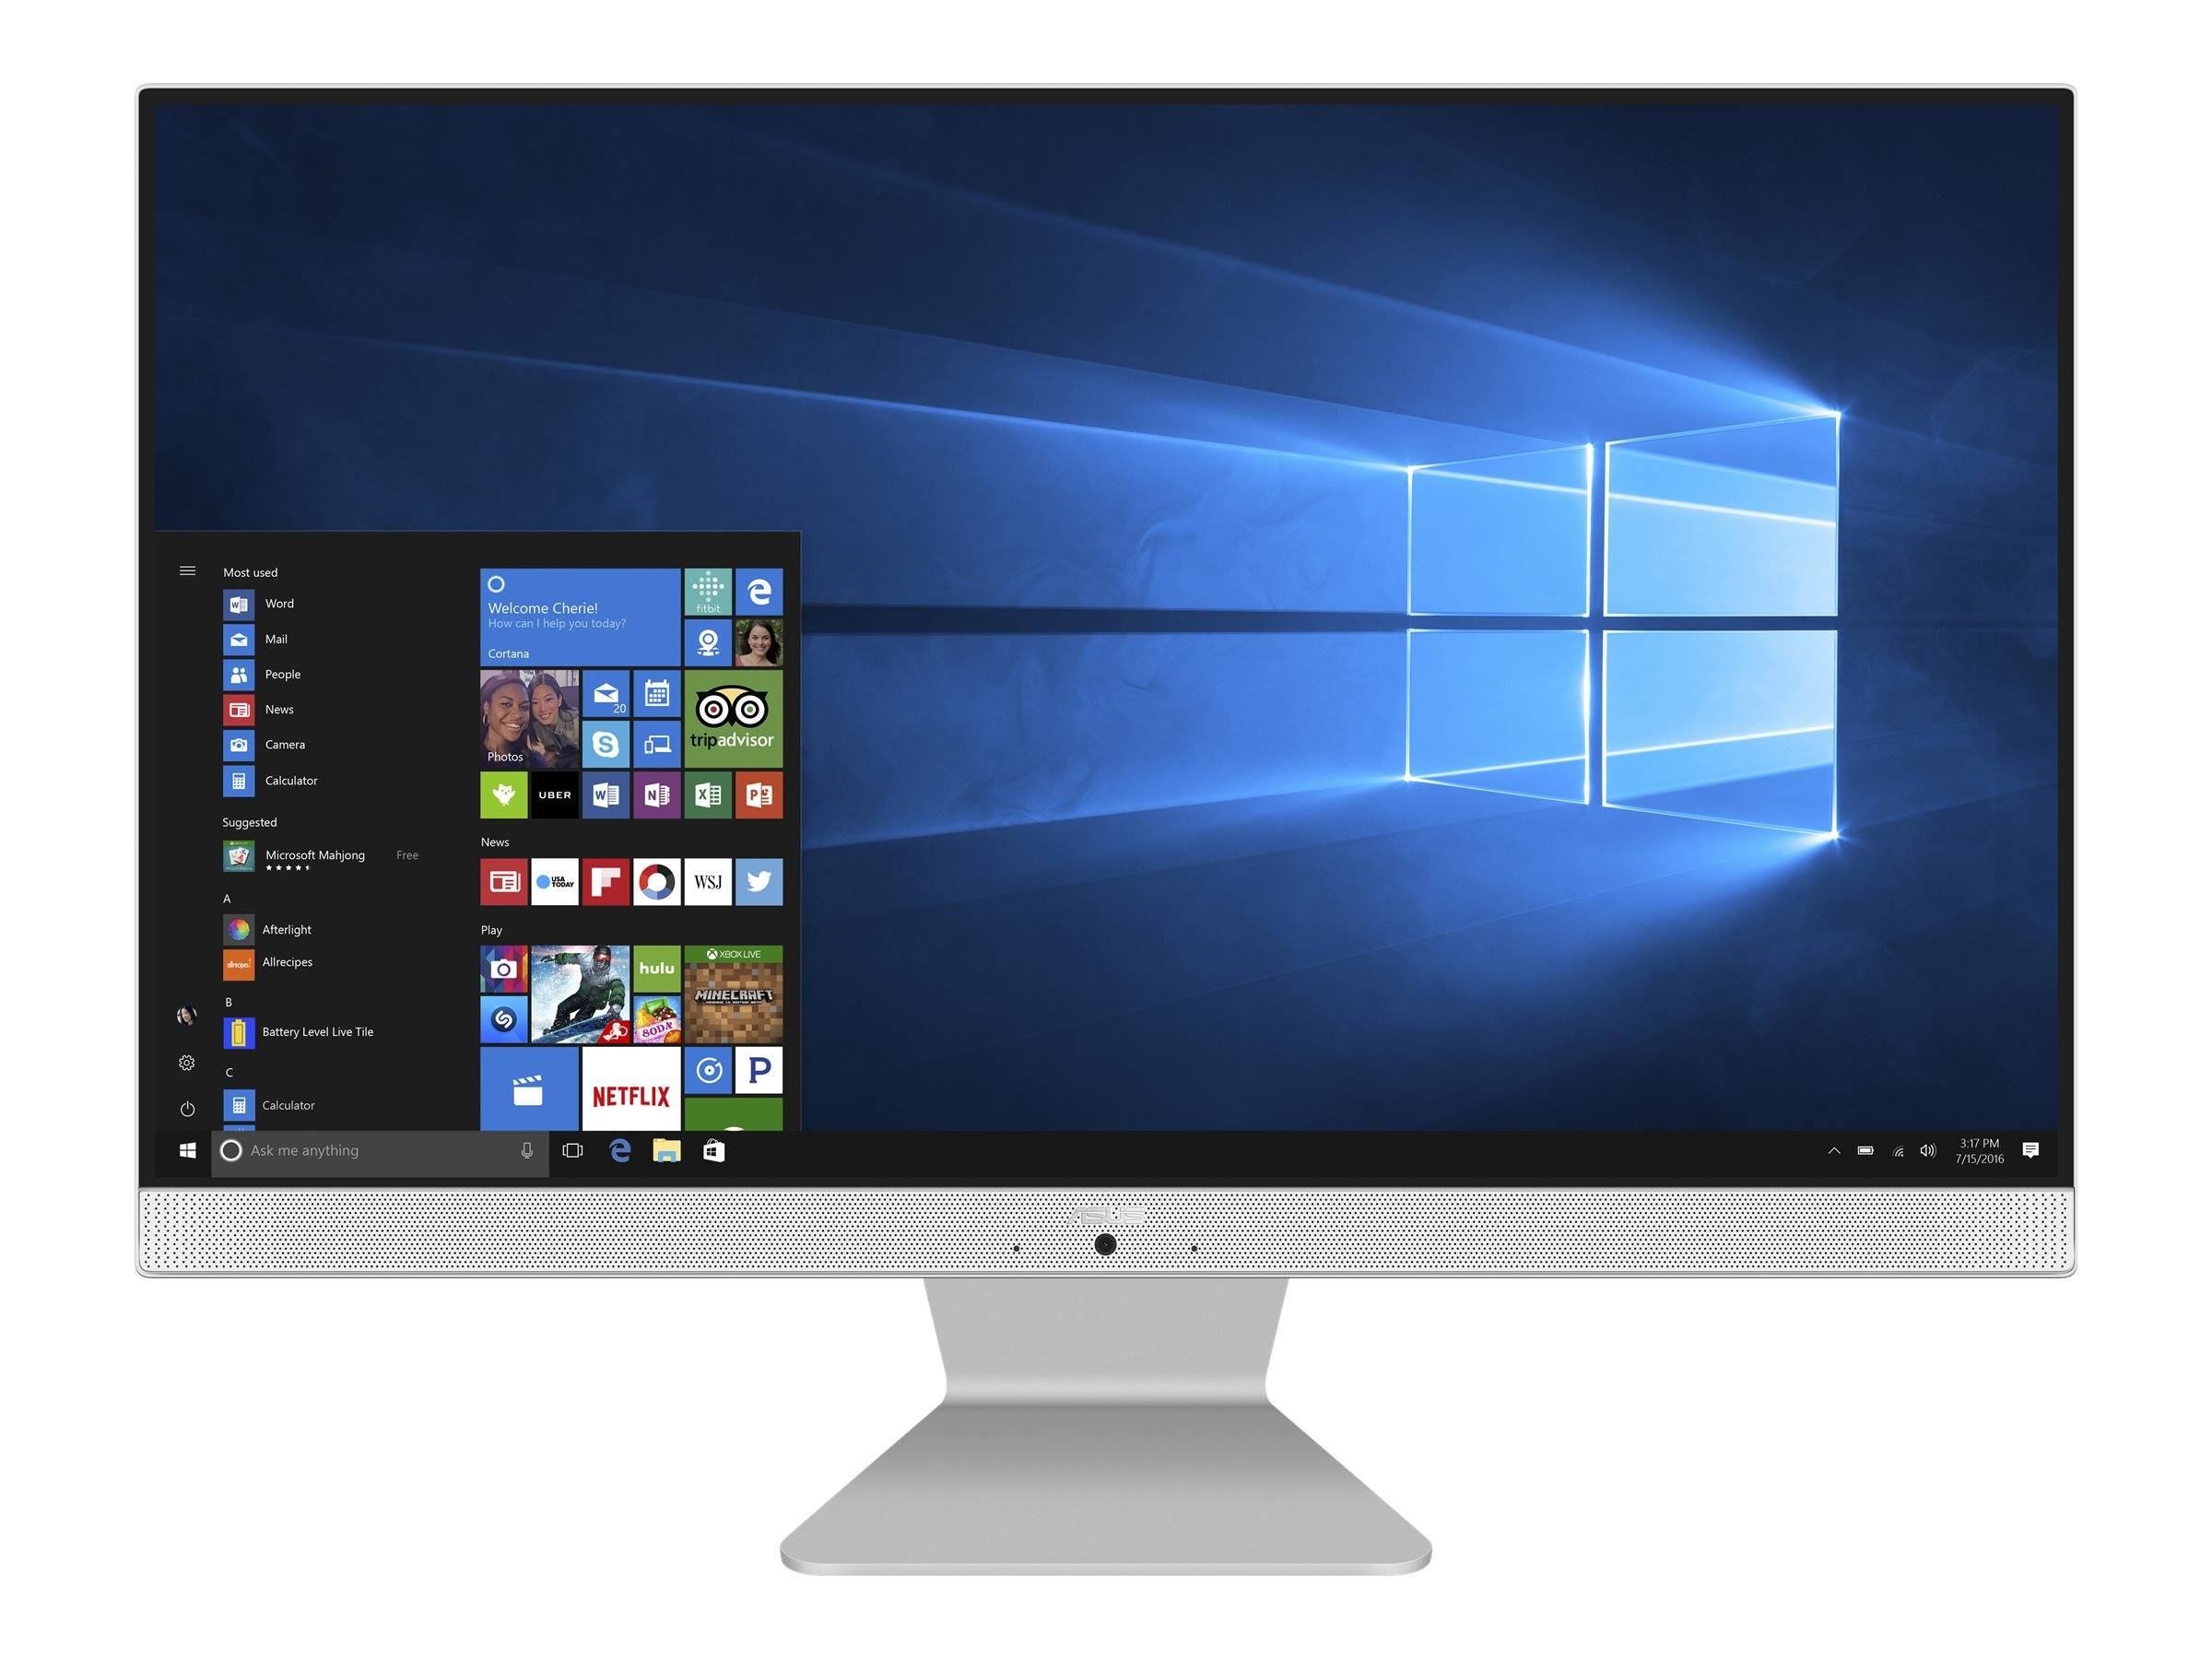 "Asus Vivo AiO V241FAK - Tout-en-un - Core i5 8265U / 1.6 GHz - RAM 8 Go - SSD 512 Go - UHD Graphics 620 - GigE - LAN sans fil: 802.11ac, Bluetooth 5.0 - Win 10 Pro - moniteur : LED 23.8"" 1920 x 1080 (Full HD)"